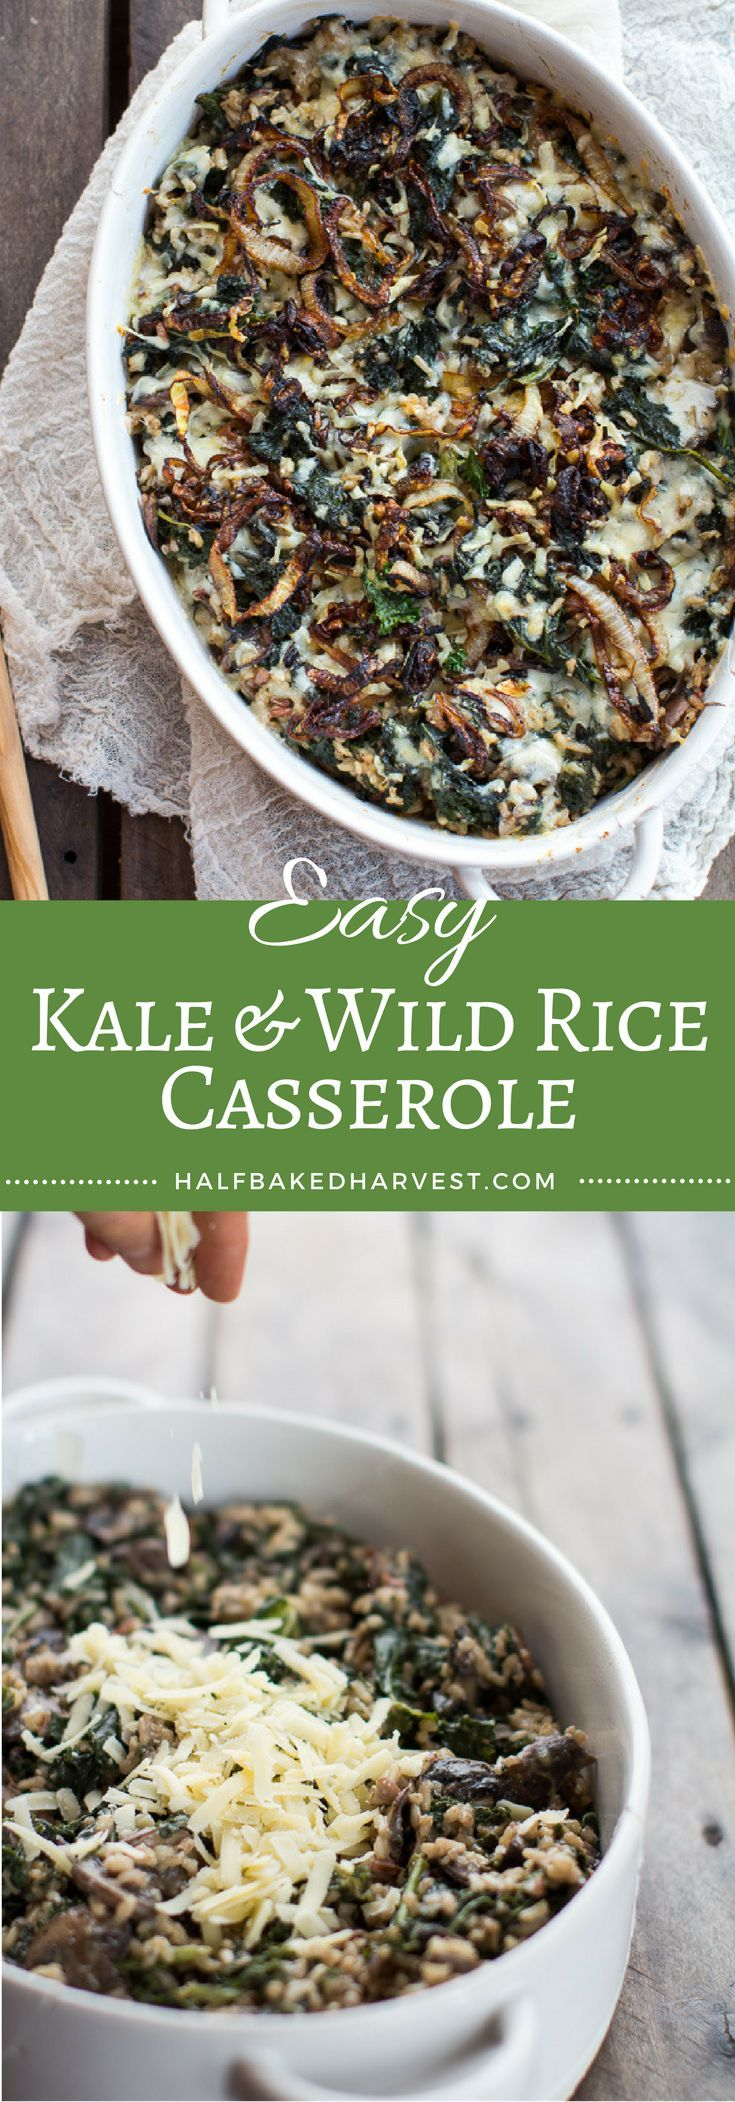 Kale and Wild Rice Casserole | halfbakedharvest.com @Half Baked Harvest